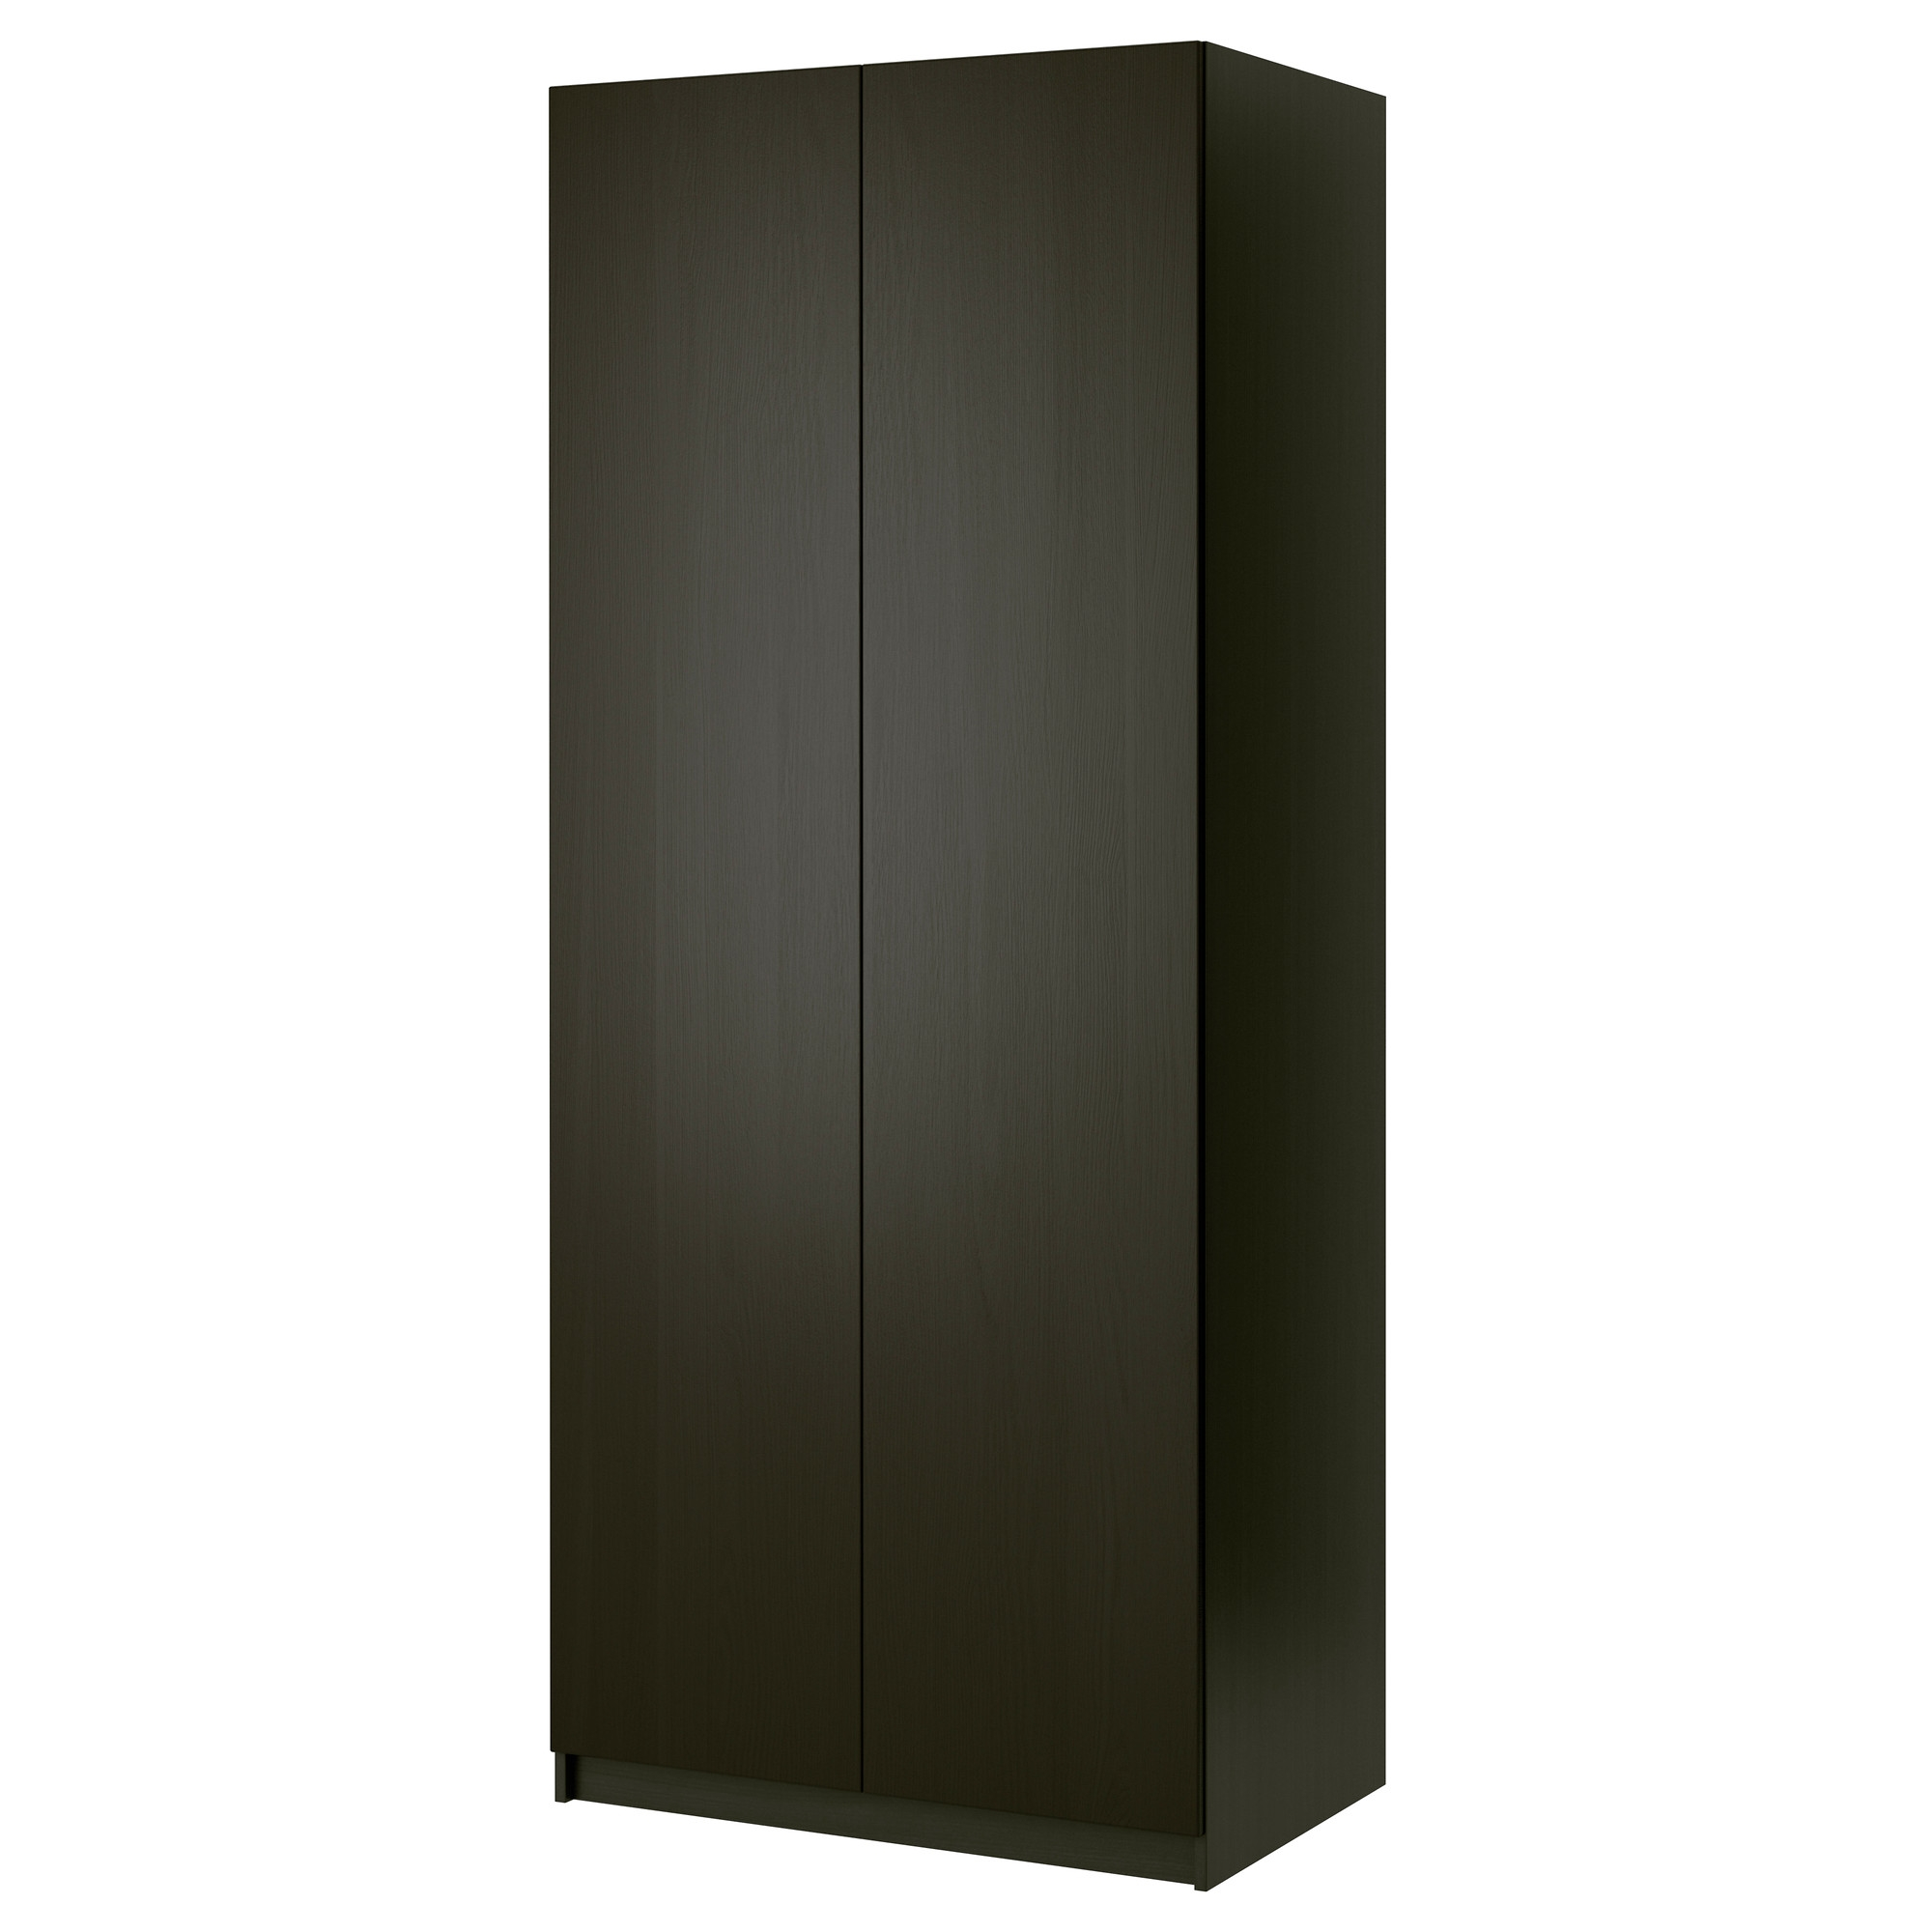 Pax armario con 2 puertas - Ikea armarios modulares ...